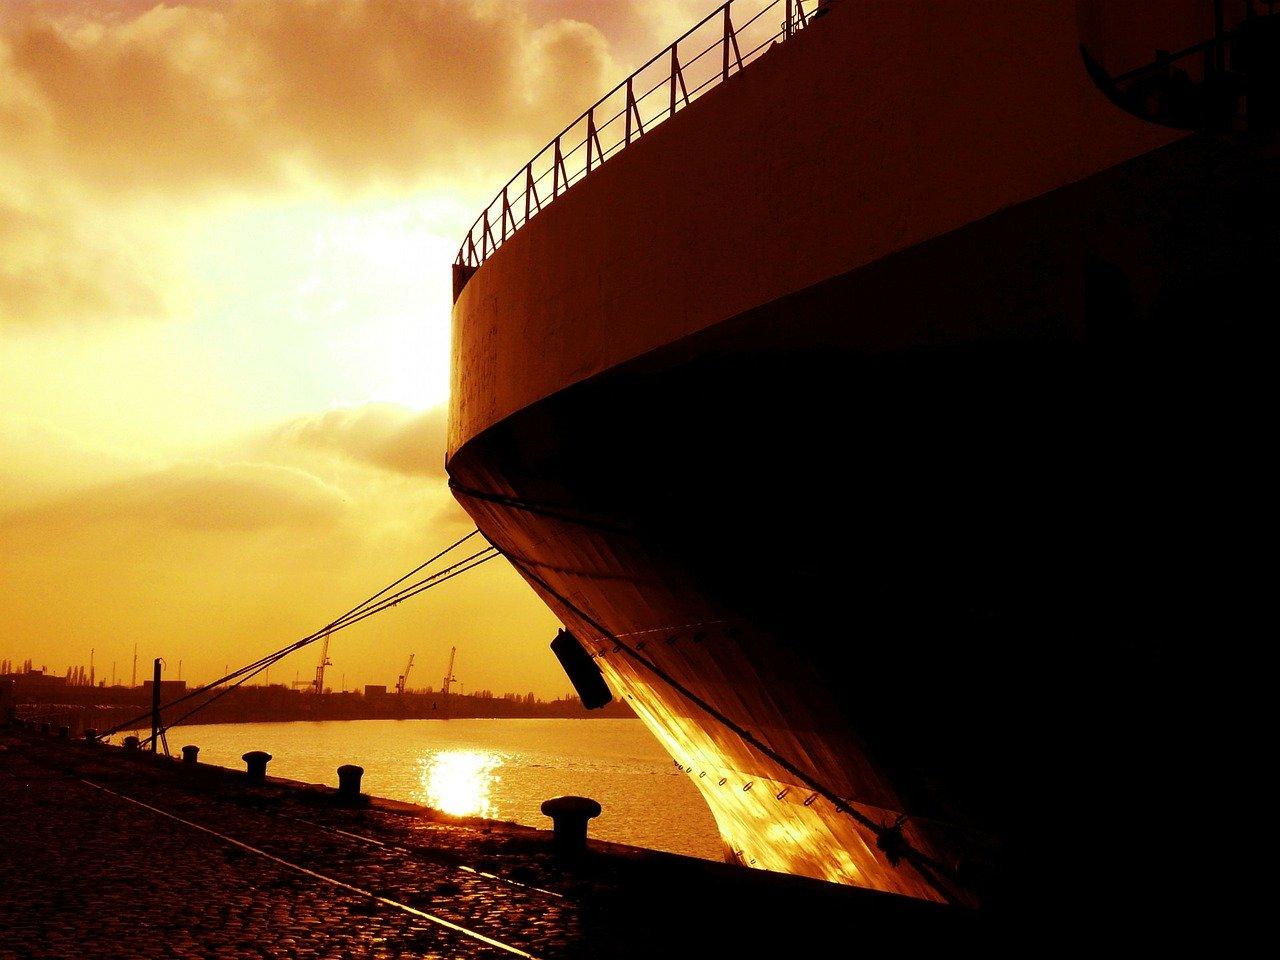 Supplier-image-3---ship-315384_1280